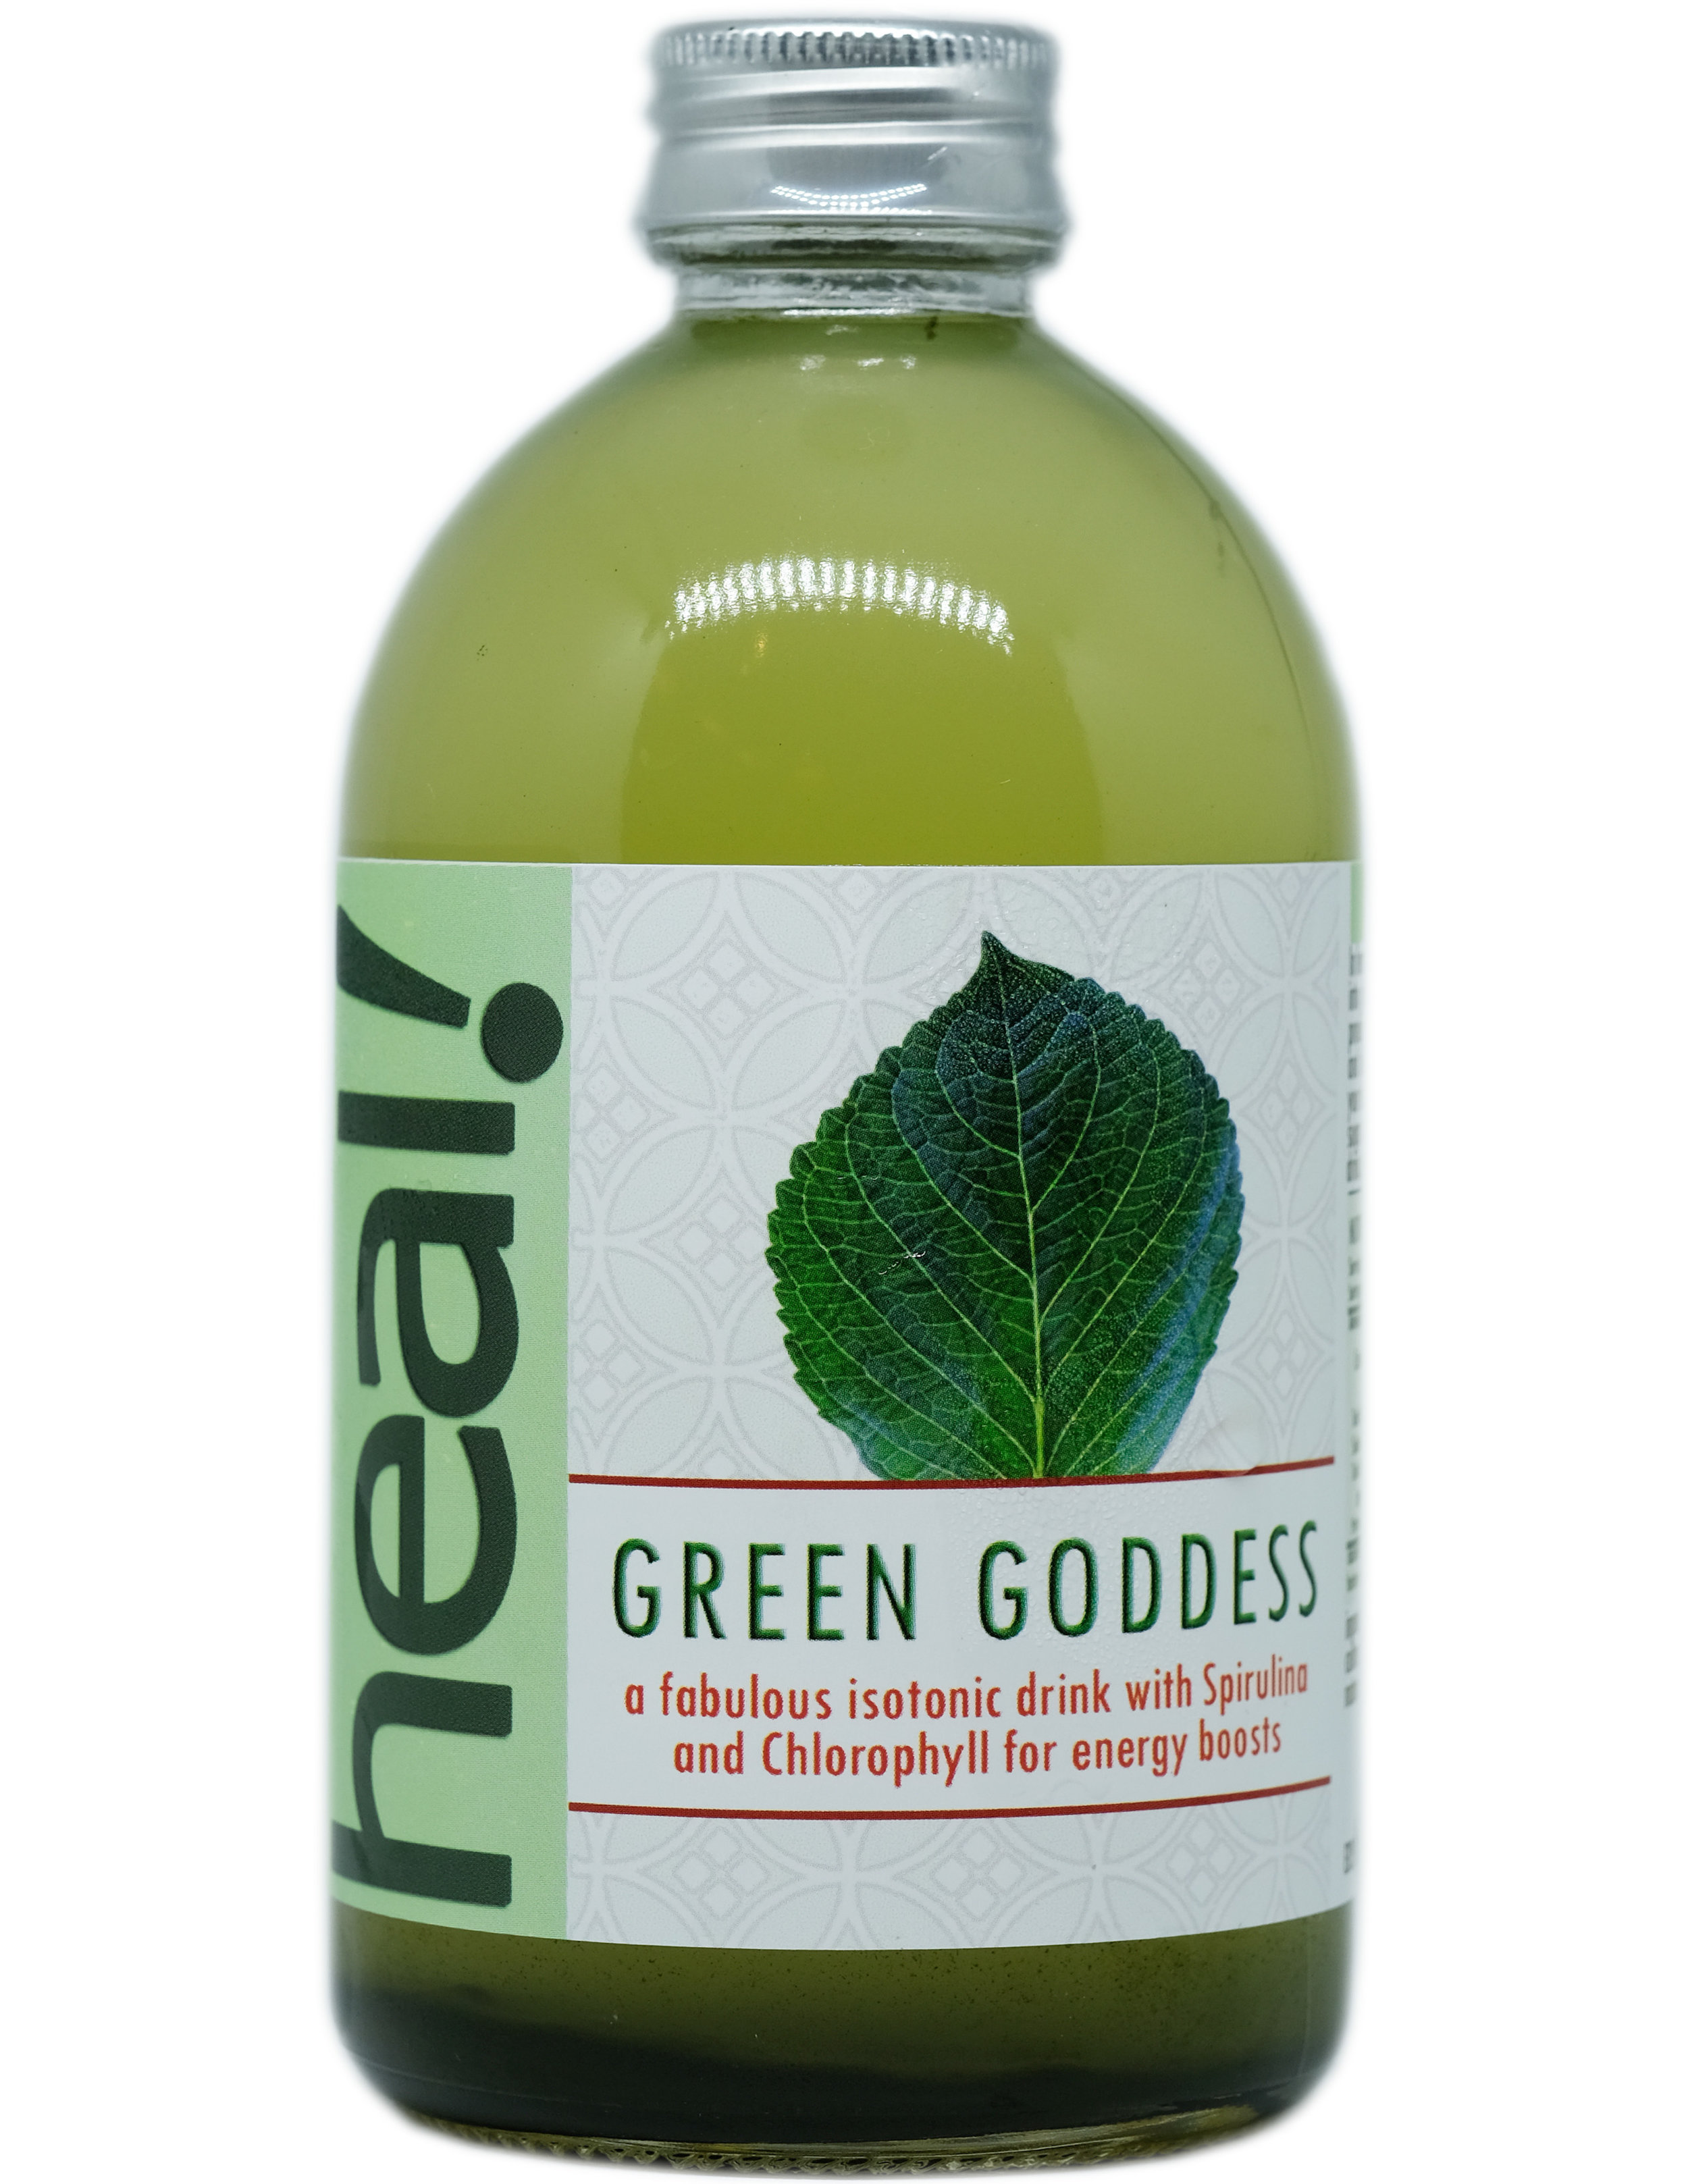 Minuman probiotik campuran ini dinamakan Green Goddess karena warnanya yang sangat hijau menarik seperti hijau Ratu Laut Selatan. Warna hijau ini disebabkan campuran Spirulina dan Klorofil yang menambah kadar kesehatan minuman ini.  Green Goddess juga isotonik, yang berarti mempunyai viskositas sama dengan sel-sel tubuh, menjadikan minuman ini baik sebagai pengganti keringat dan ion-ion hilang setelah jatuh sakit.  Spirulina mengandung omega 6, omega 3, protein, vitamin B1, B2, B3, tembaga, zat besi, magnesium, potasium, mangan dan hamper semua nutrisi yang kita perlukan. Klorofil meningkatkan imunitas, membantu detoksifikasi, membersihkan darah, dan meningkatkan energi.  Komposisi: Air Mineral, Kultur Kombucha, Kultur Water Kefir, Teh Jawa Oolong, Gula Tebu Alami, Spirulina, Klorofil  Kalori 20, Gula 3 gram per 175 ml sebelum fermentasi kedua yang membuat kadar kalori dan gula akan menjadi lebih rendah lagi.  Minuman ini dikemas dalam botol gelas, 100 %  recyclable, reusable, dan  refundable.  370 ml.  RESEP  klik di sini   KONTAK KAMI  klik di sini